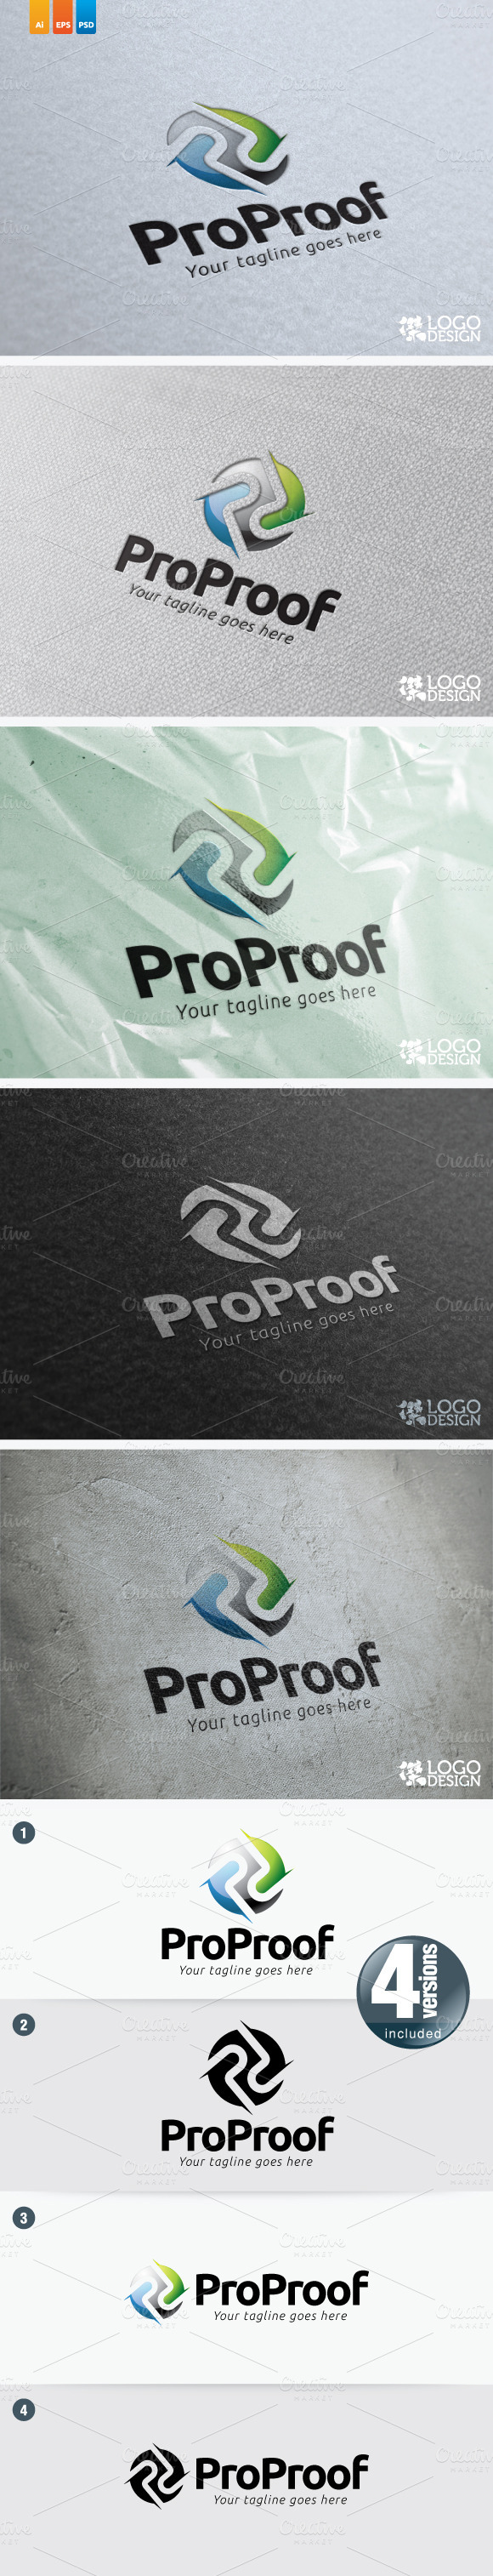 Pro Proof